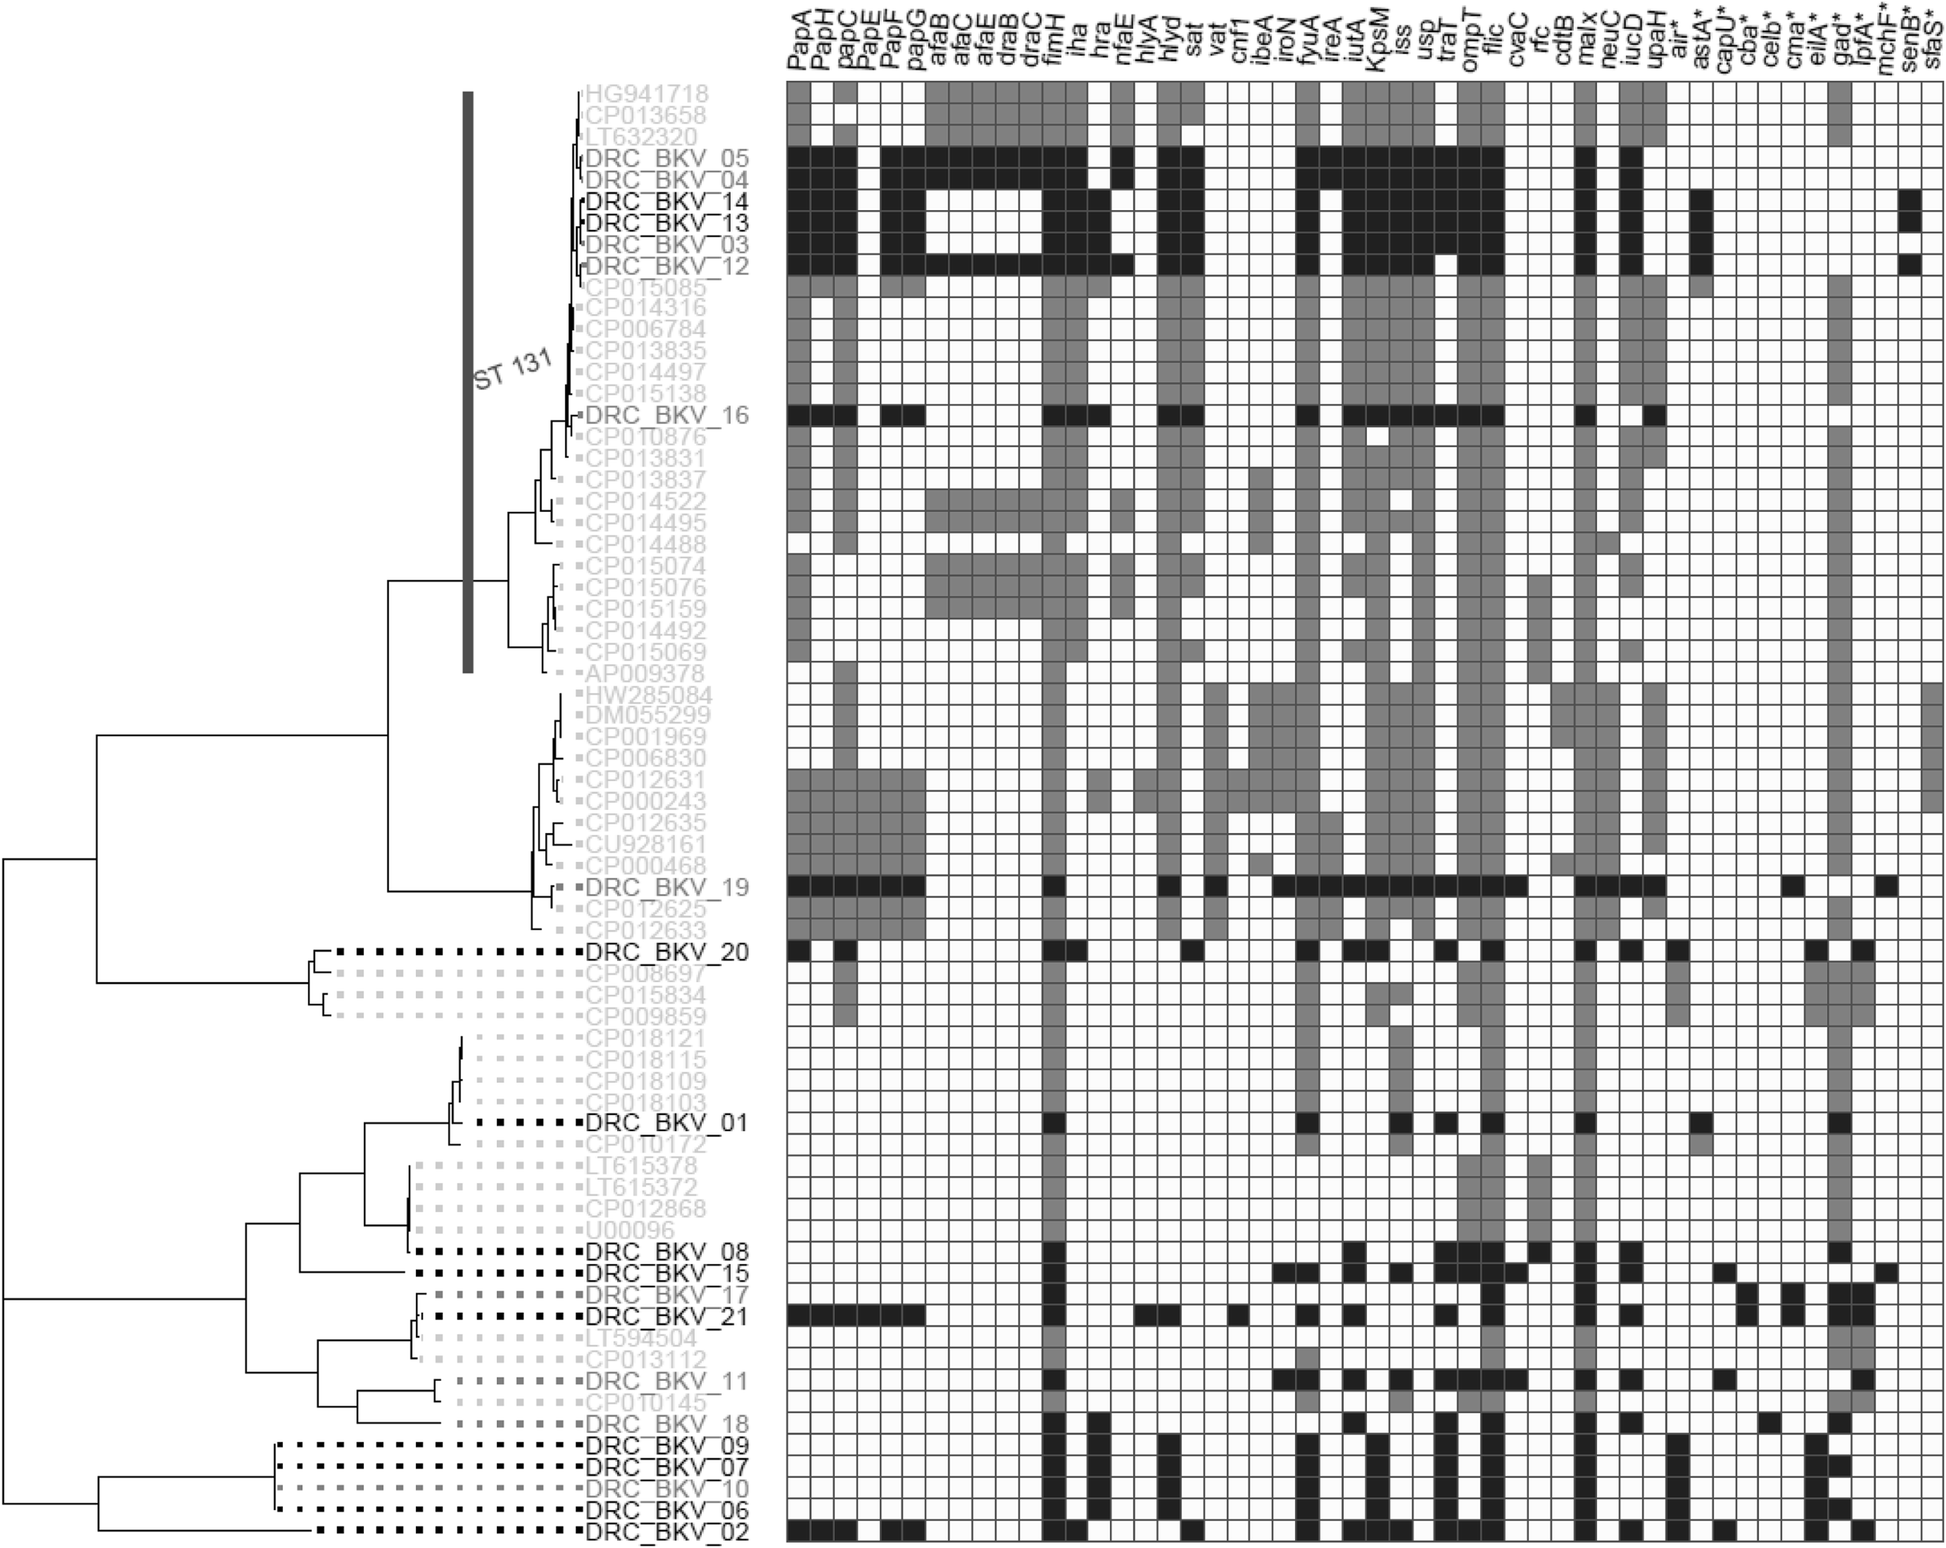 Whole-genome sequences of multidrug-resistant Escherichia